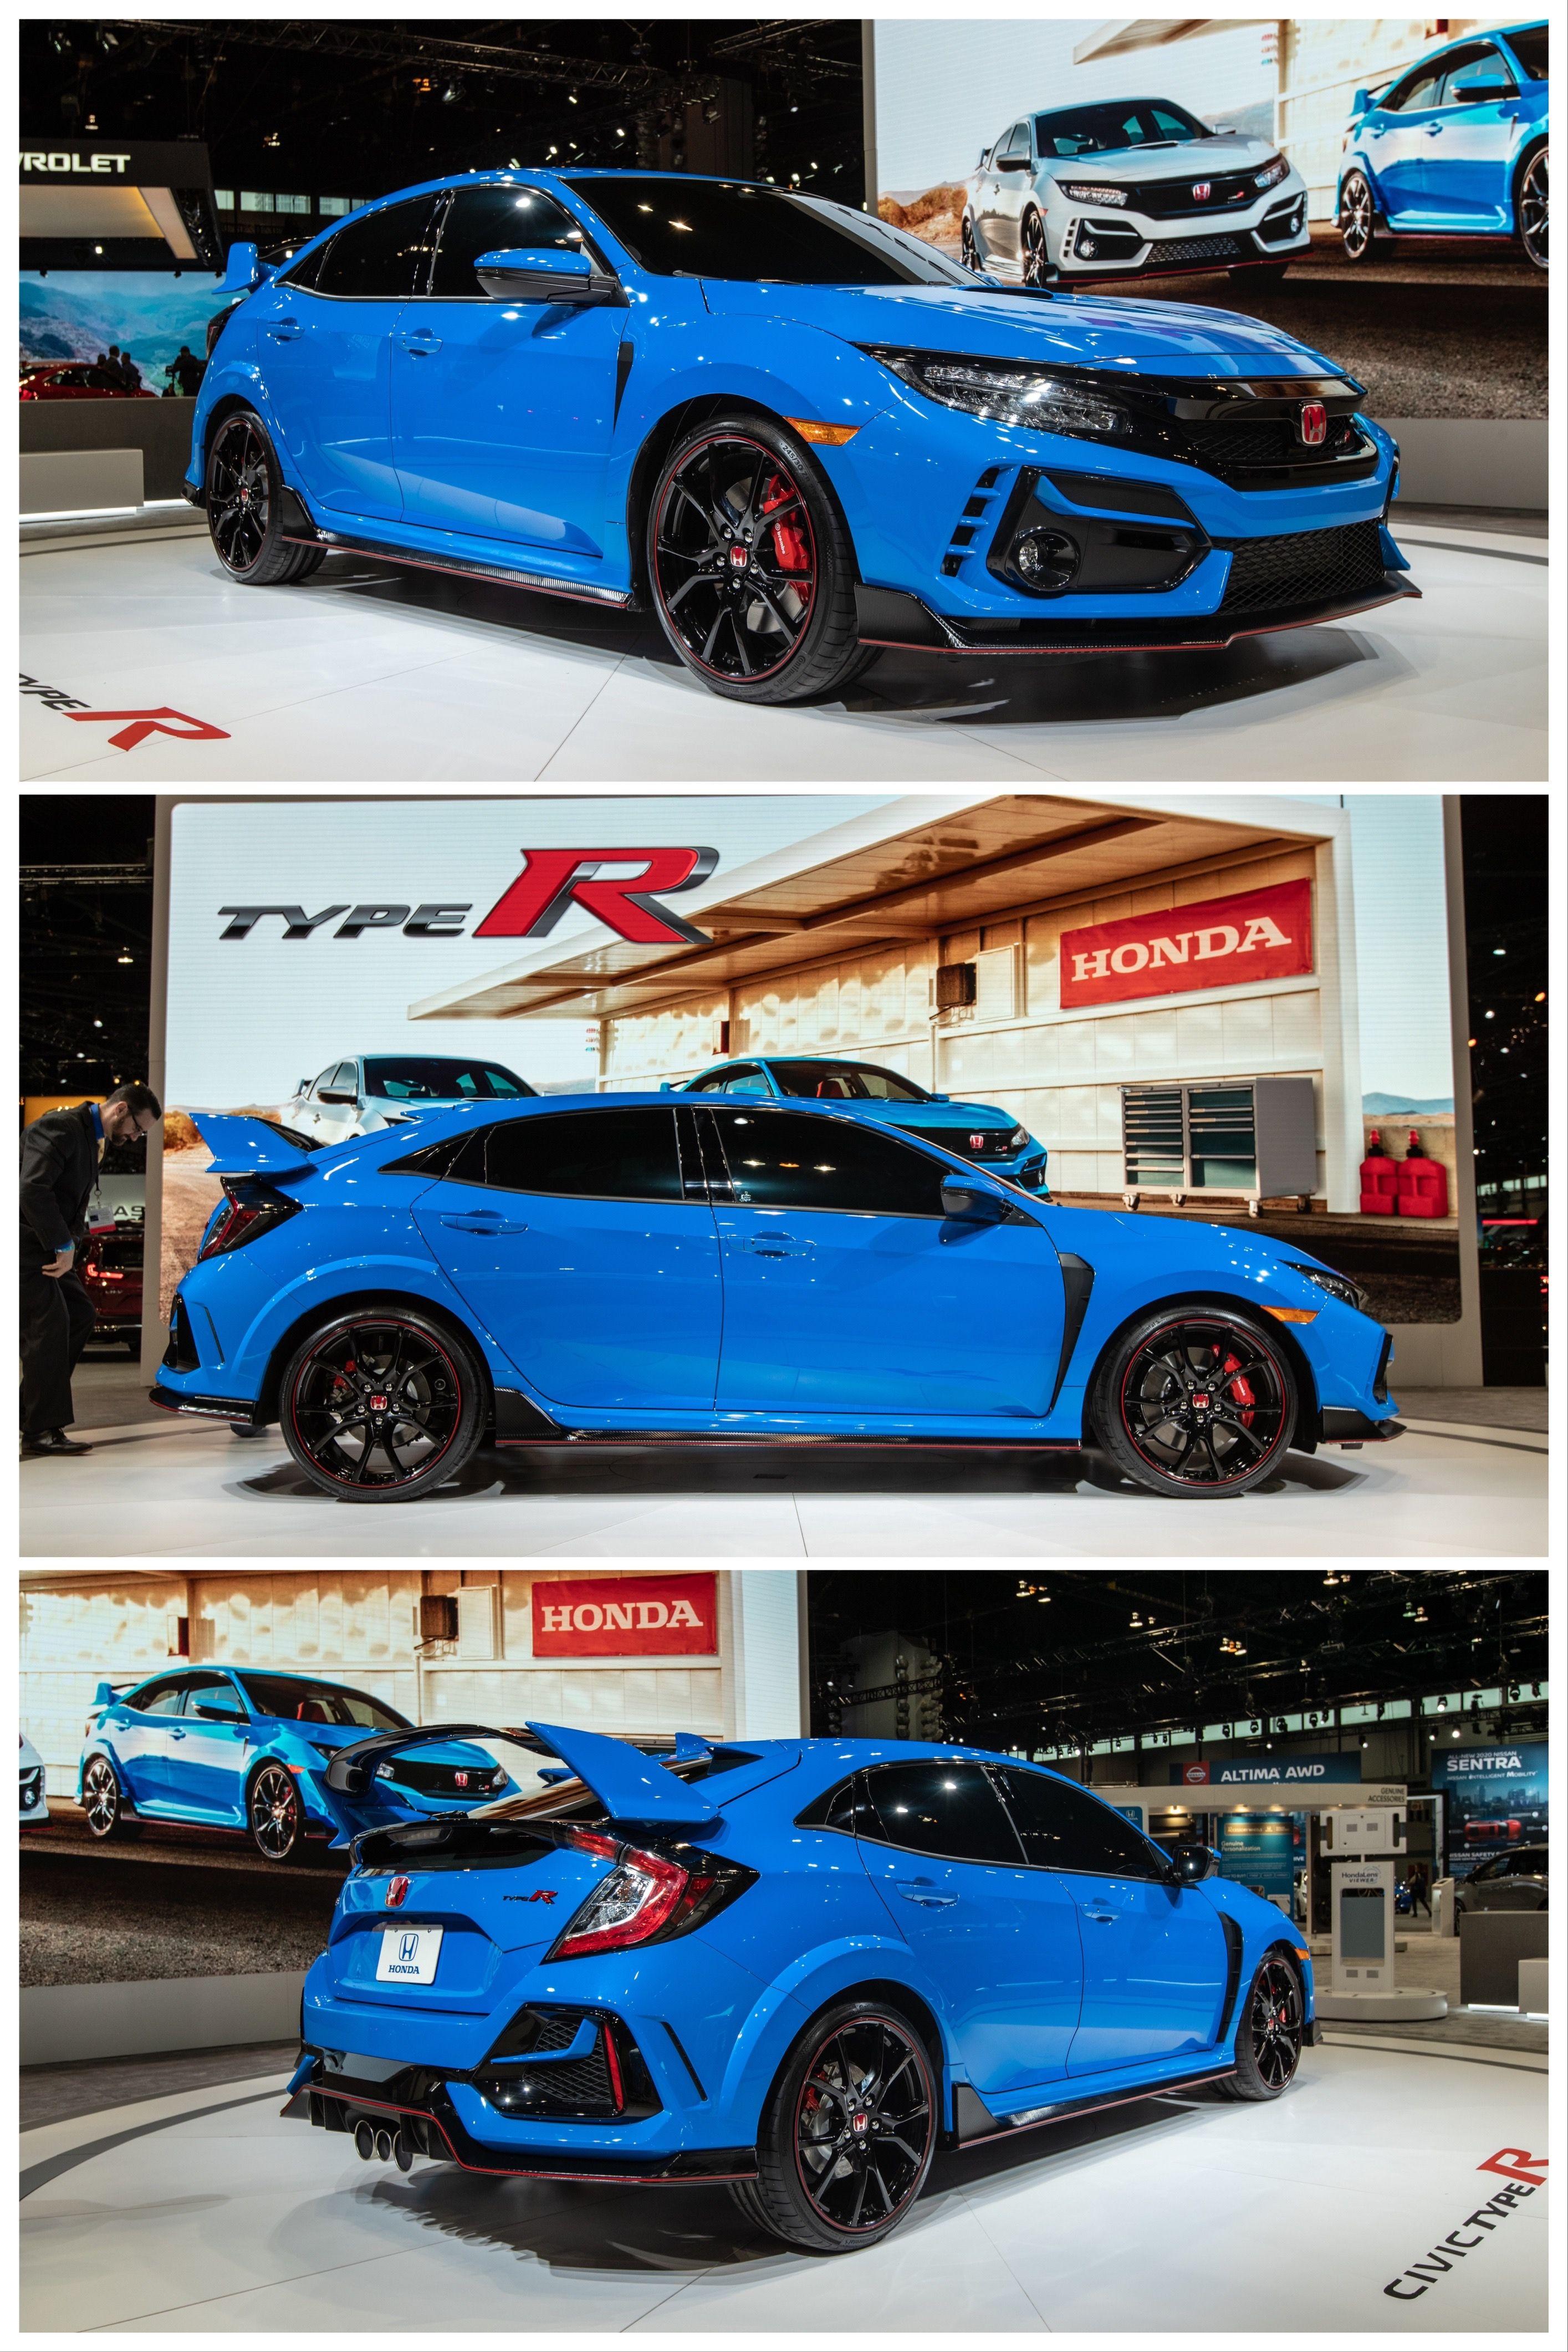 2020 Honda Civic Type R Gets Updated Suspension Brakes In 2020 Honda Civic Type R Honda Civic Civic